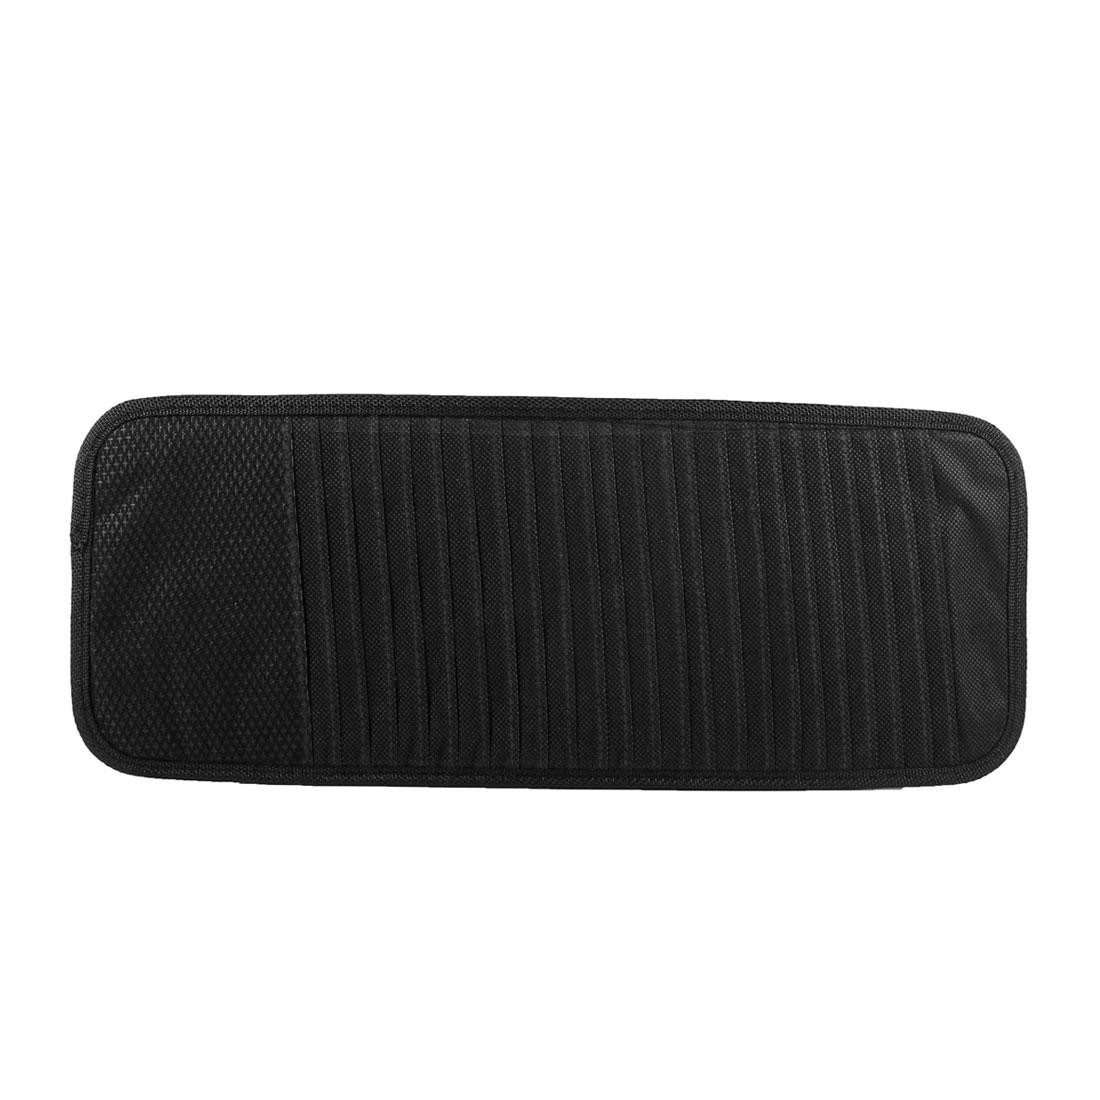 Vehicle Car Sun Visor 24 Slots CD DVD Holder Bag Case Container Black